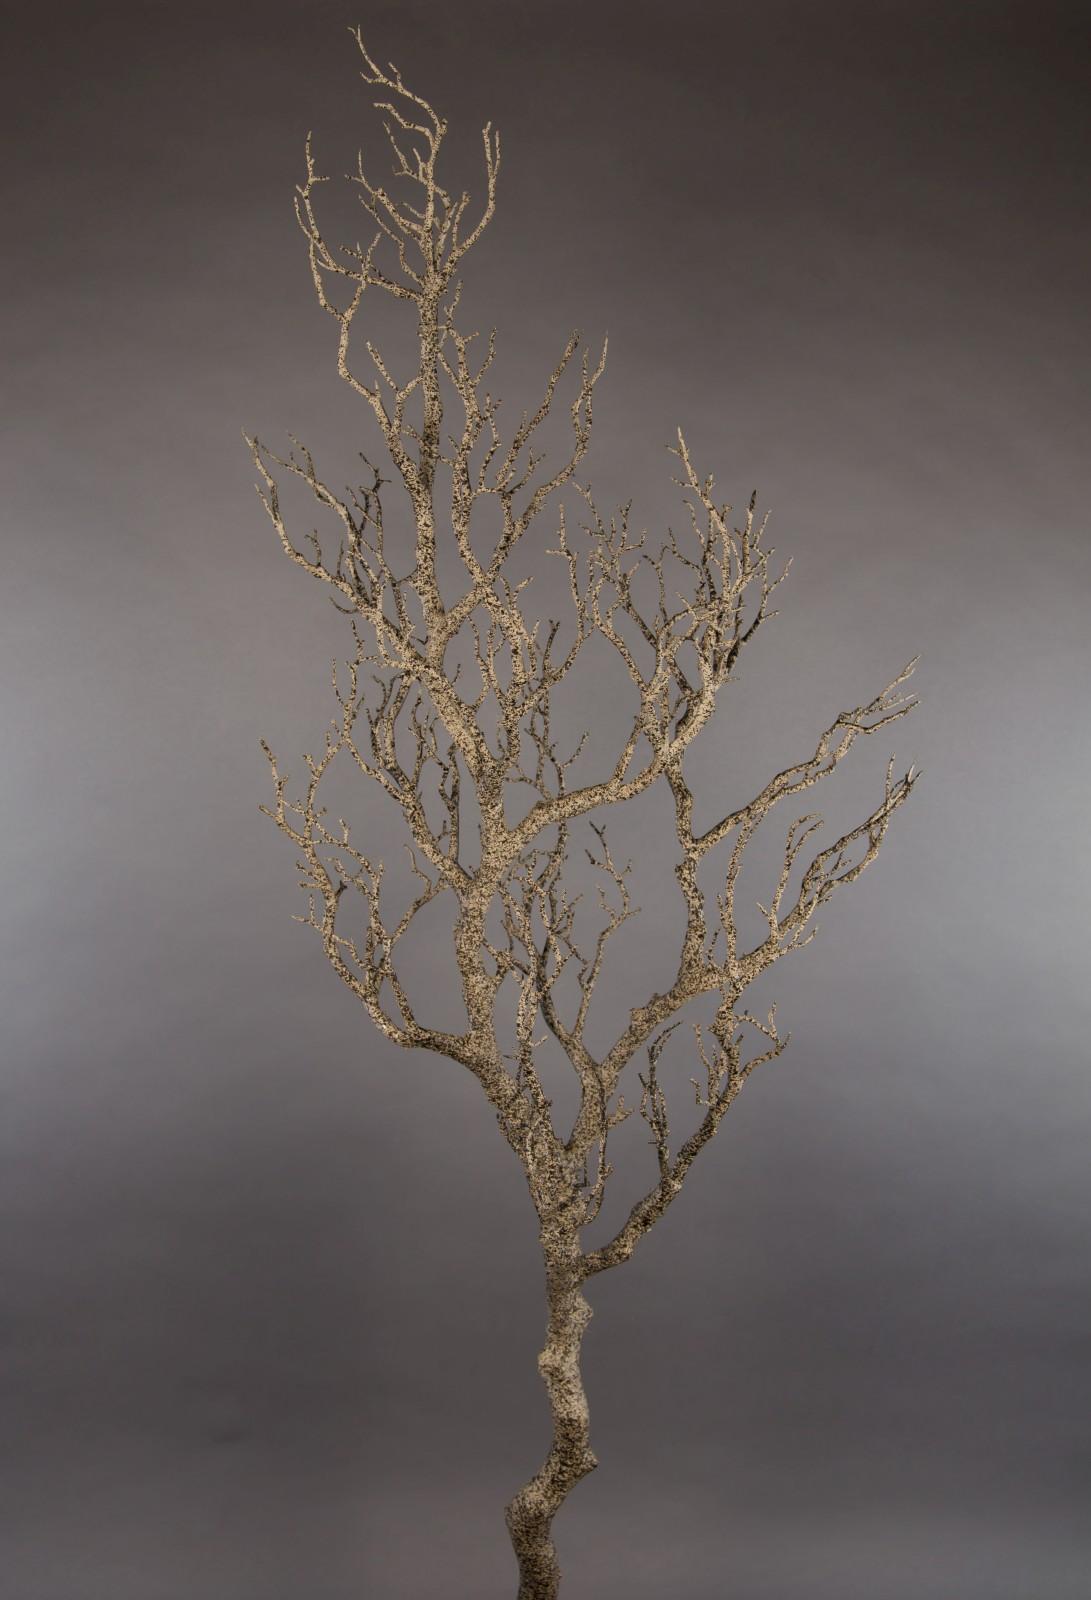 gro er dekoast dekozweig 120cm yf k nstlicher ast kunstzweig kunstast ebay. Black Bedroom Furniture Sets. Home Design Ideas